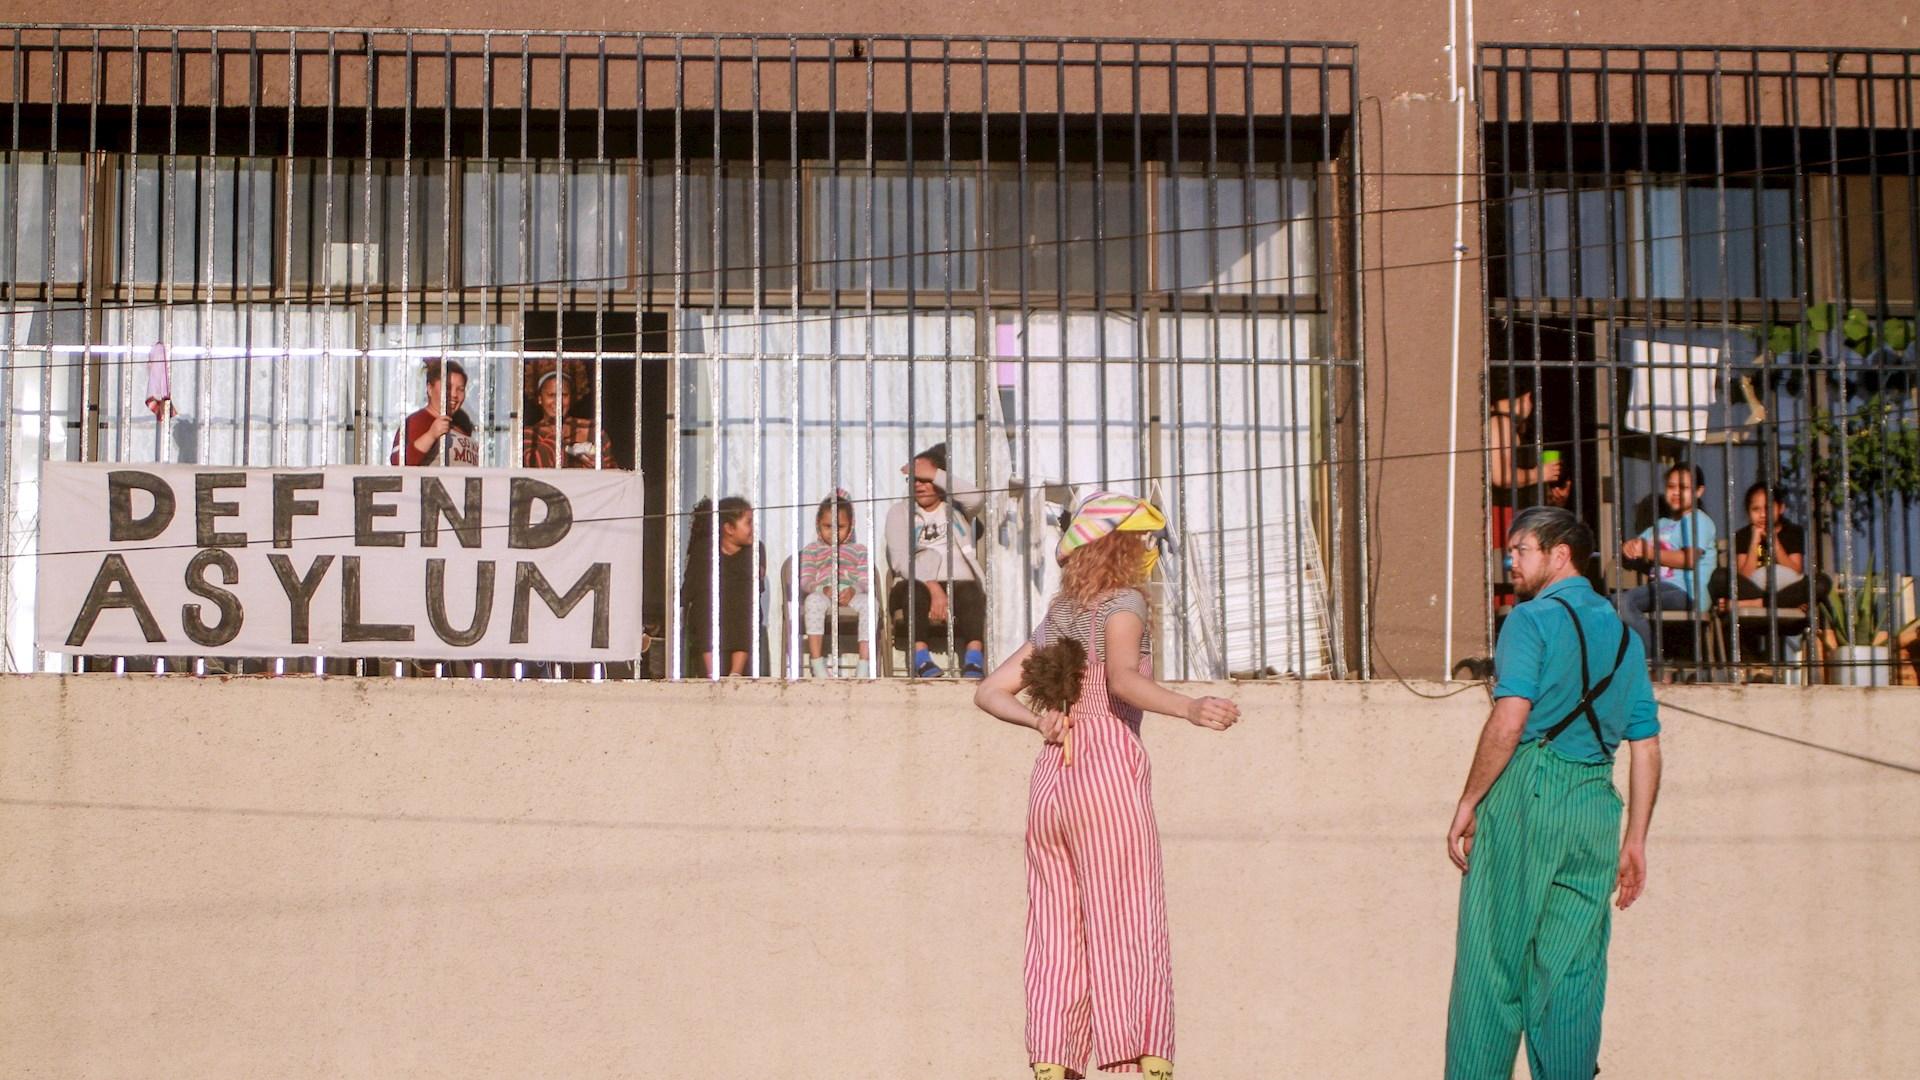 Circo niños migrantes Tijuana 2